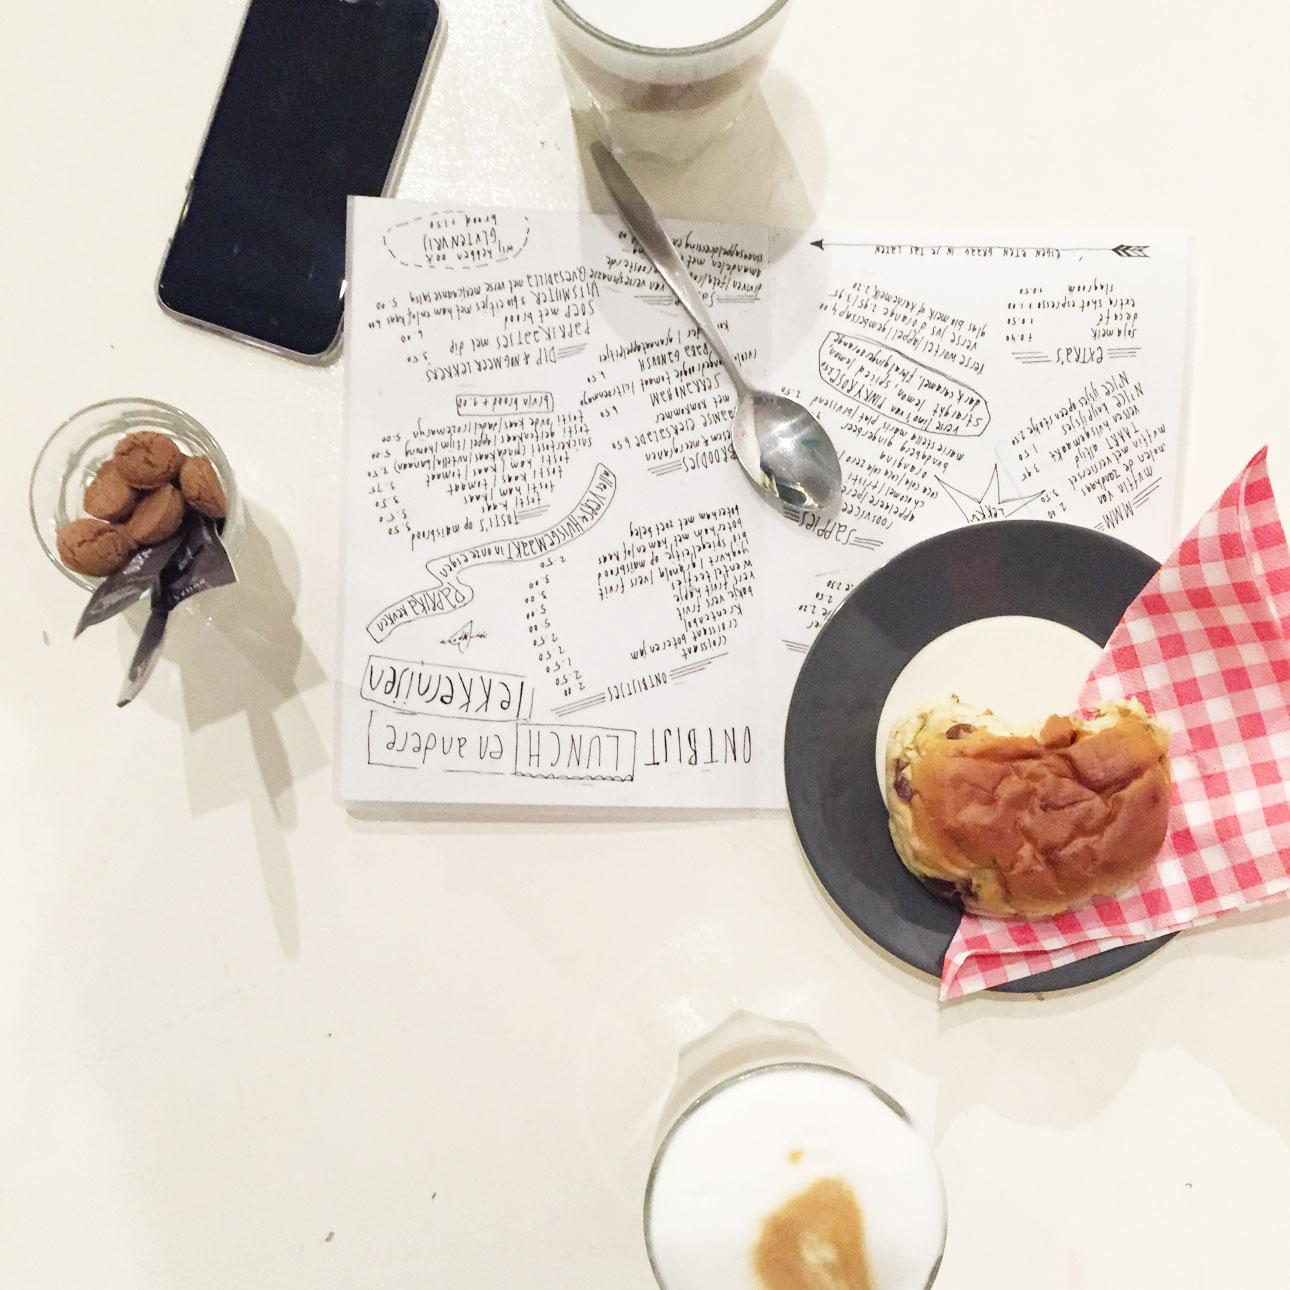 Mamalifestyle november 2015 Koffie met vriendin